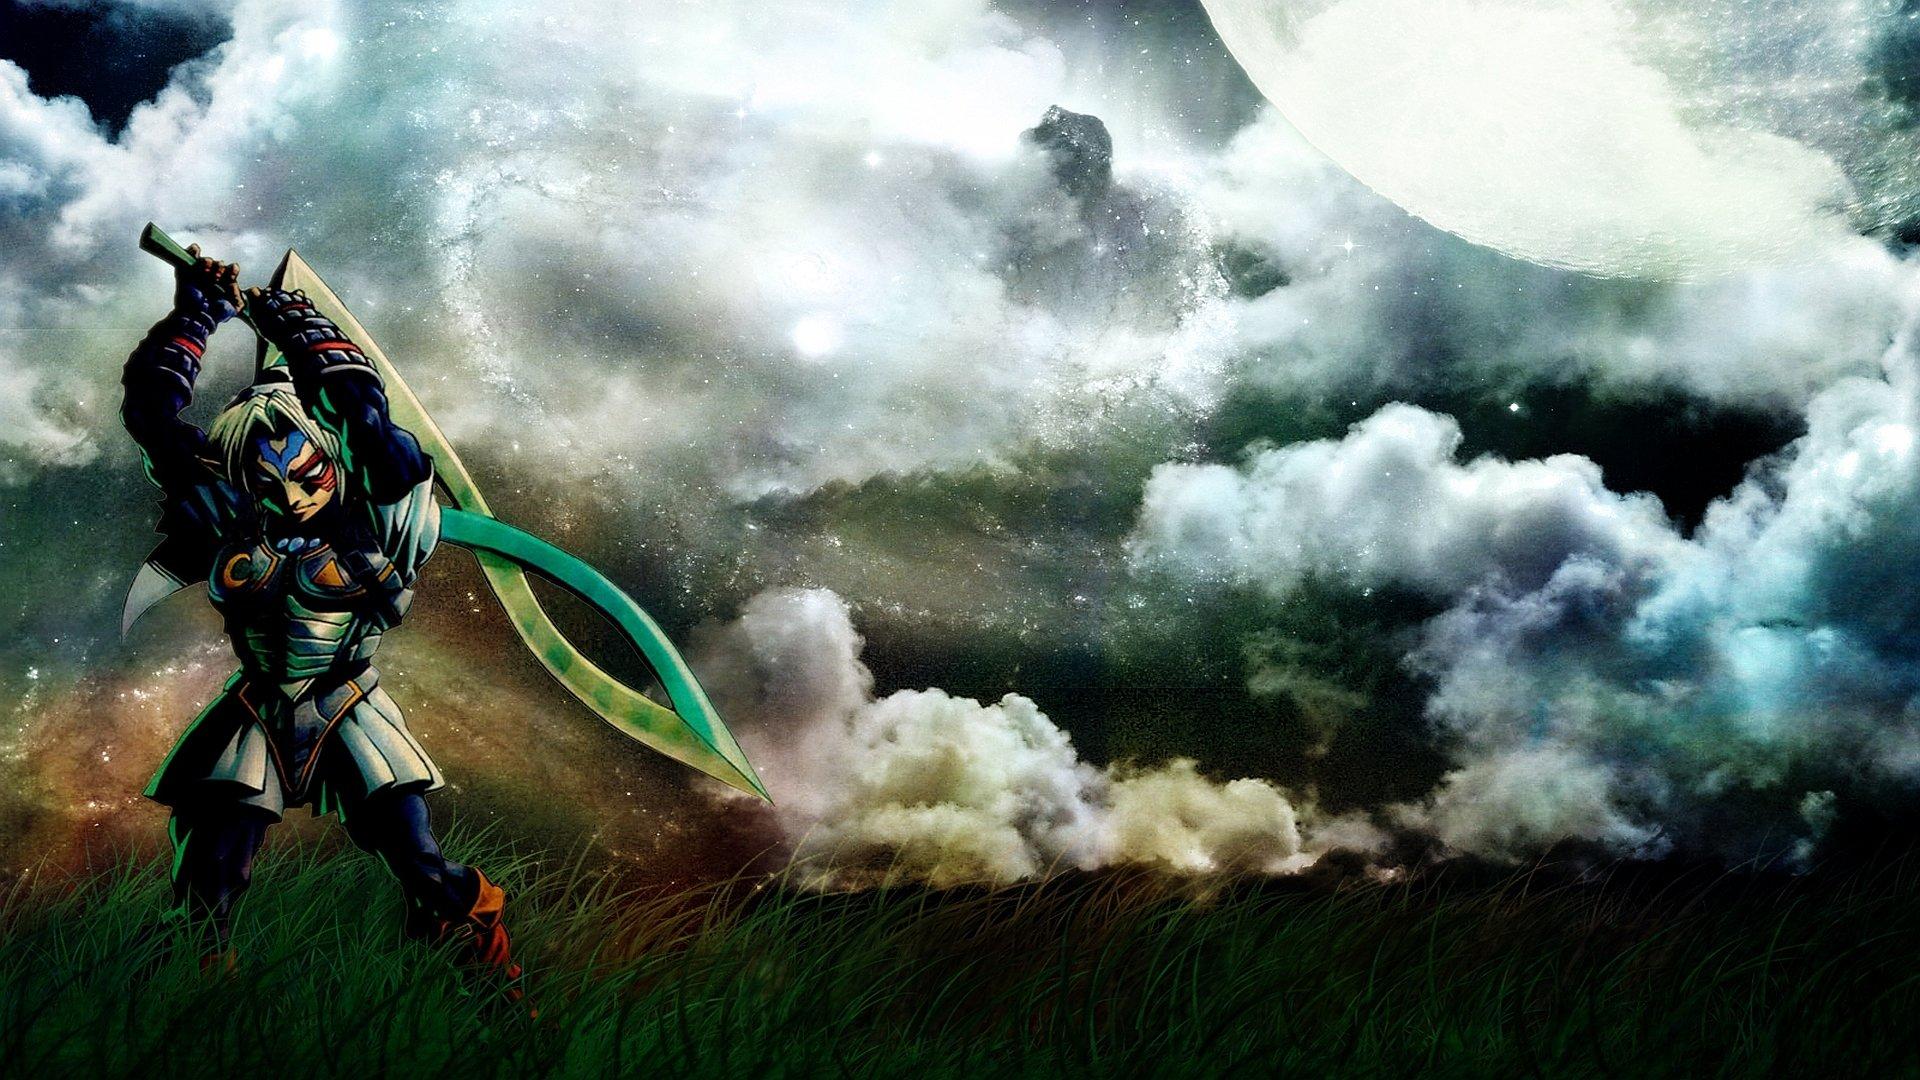 The Legend Of Zelda: Majora's Mask HD Wallpaper ...